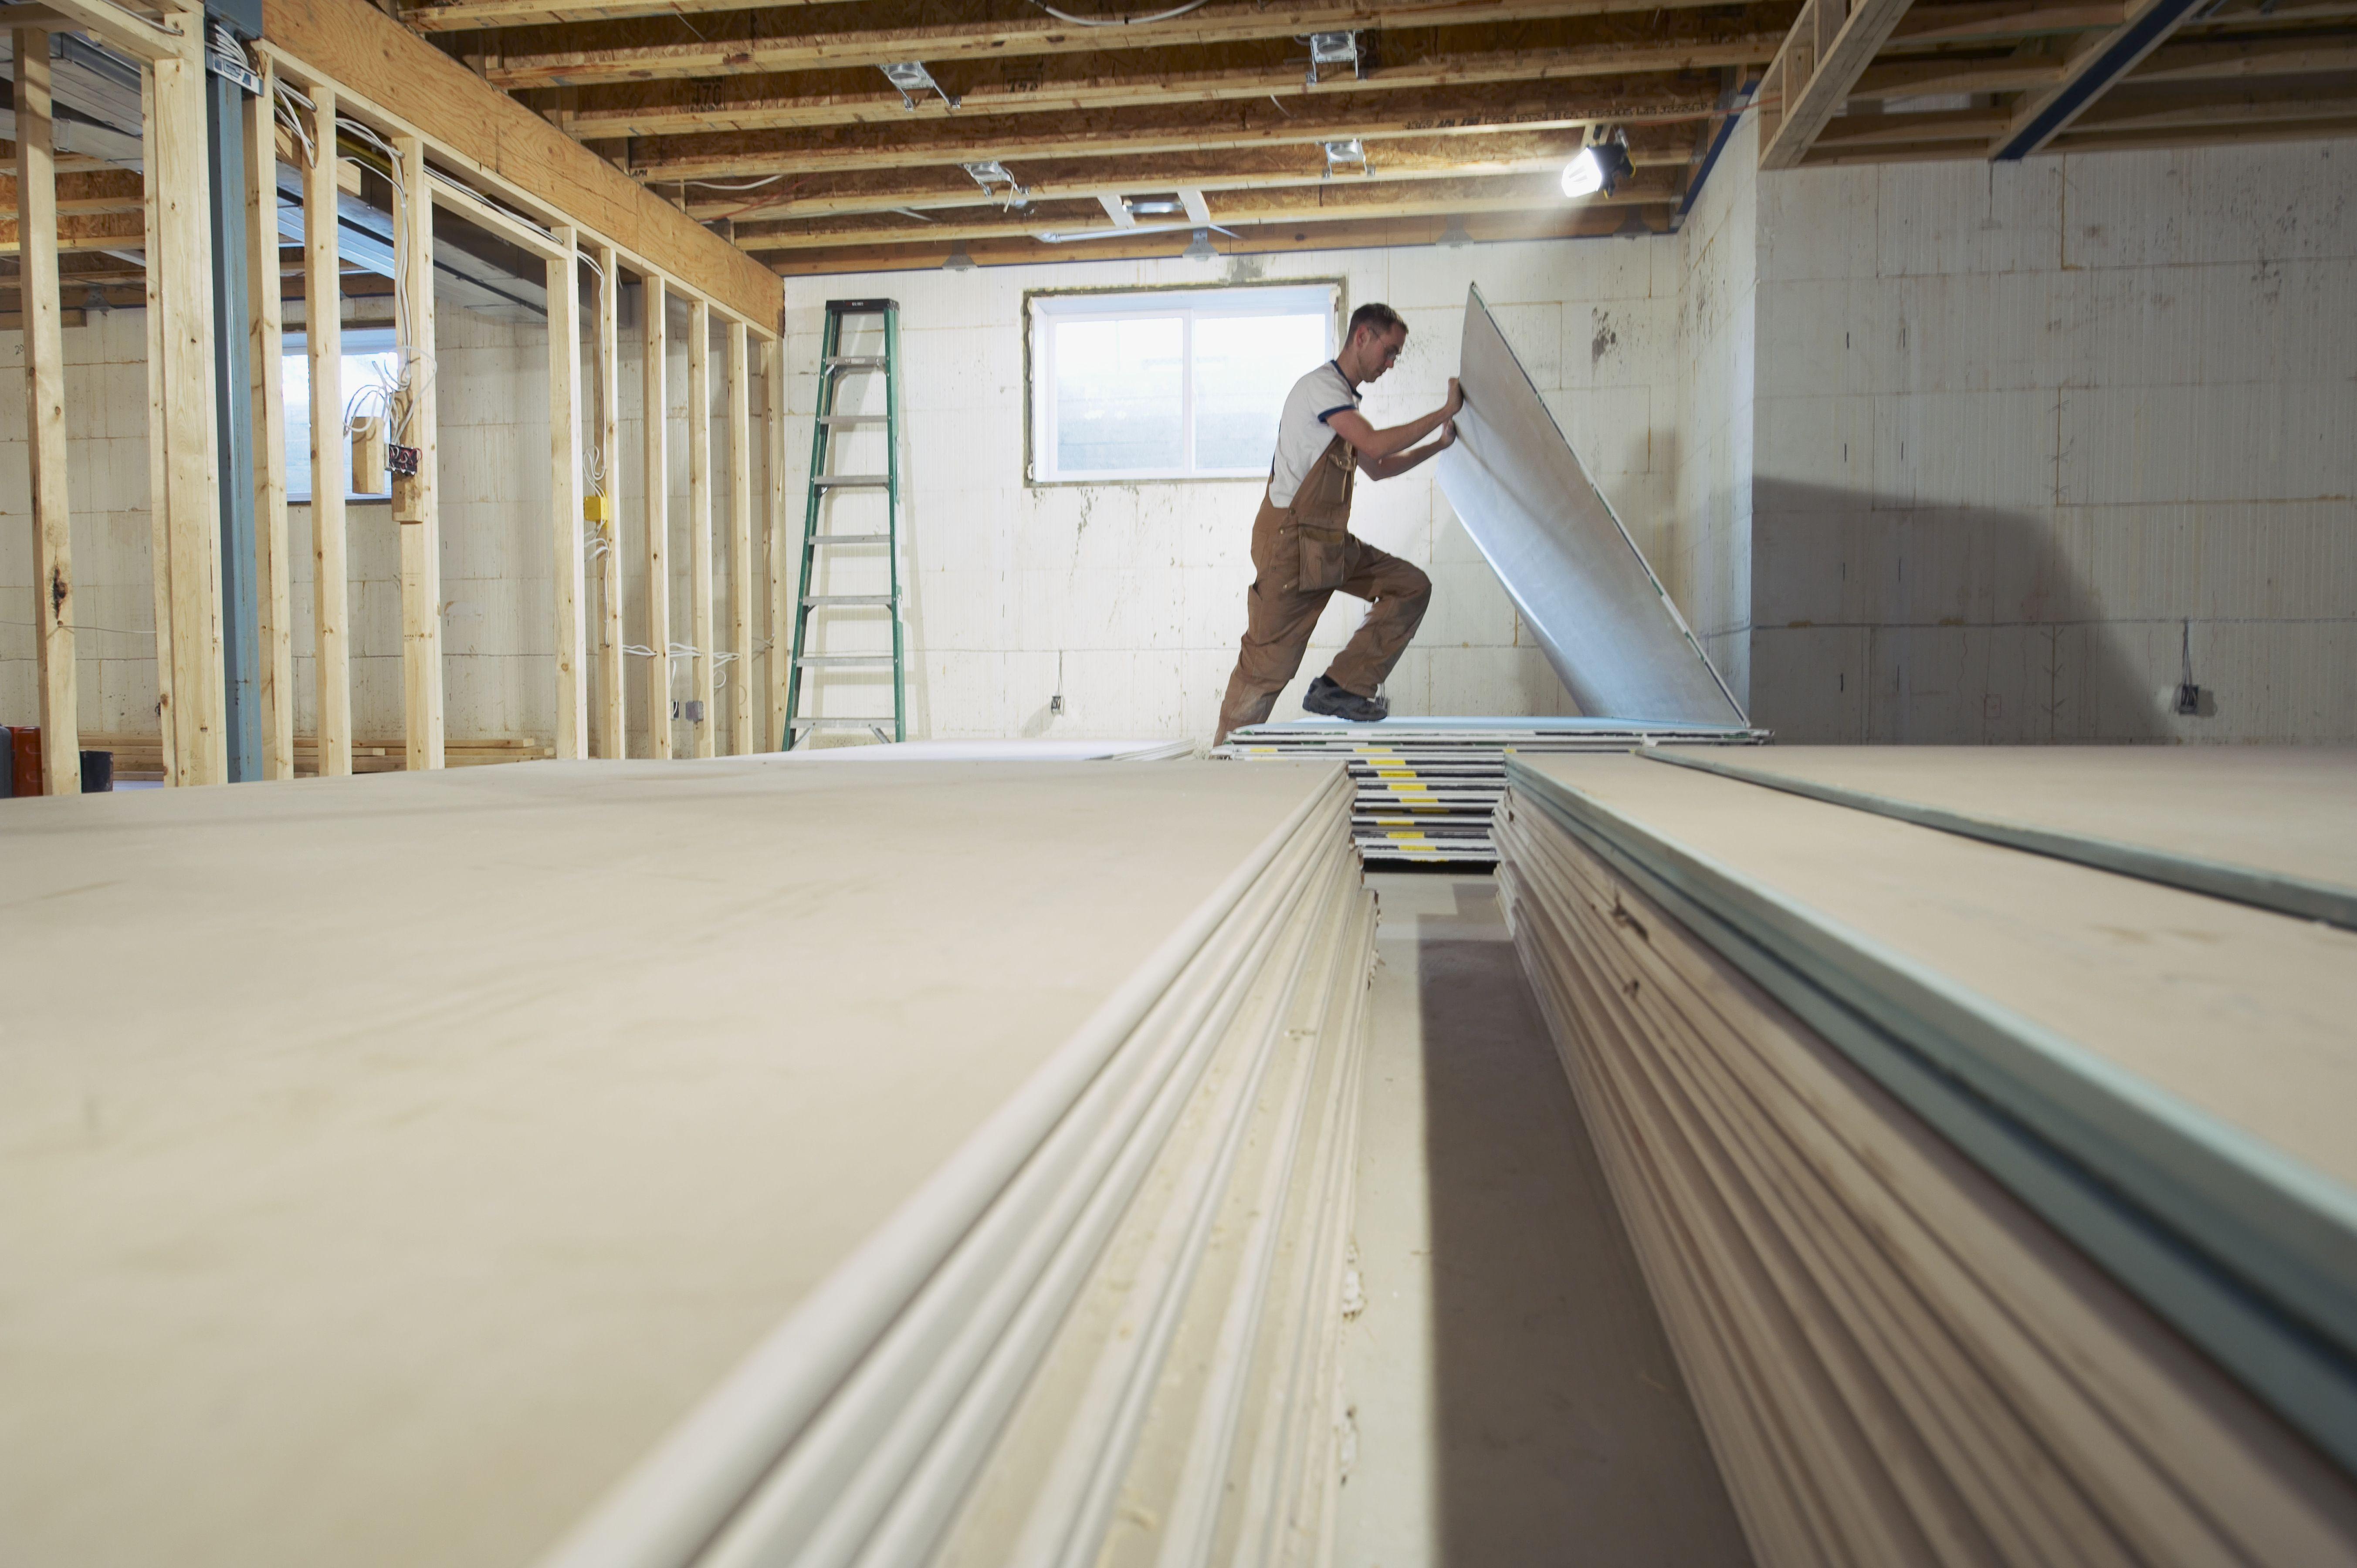 cost to refinish hardwood floors denver of average basement finishing cost in man installing drywall in new house 522951112 5b12da6dba6177003d66594d